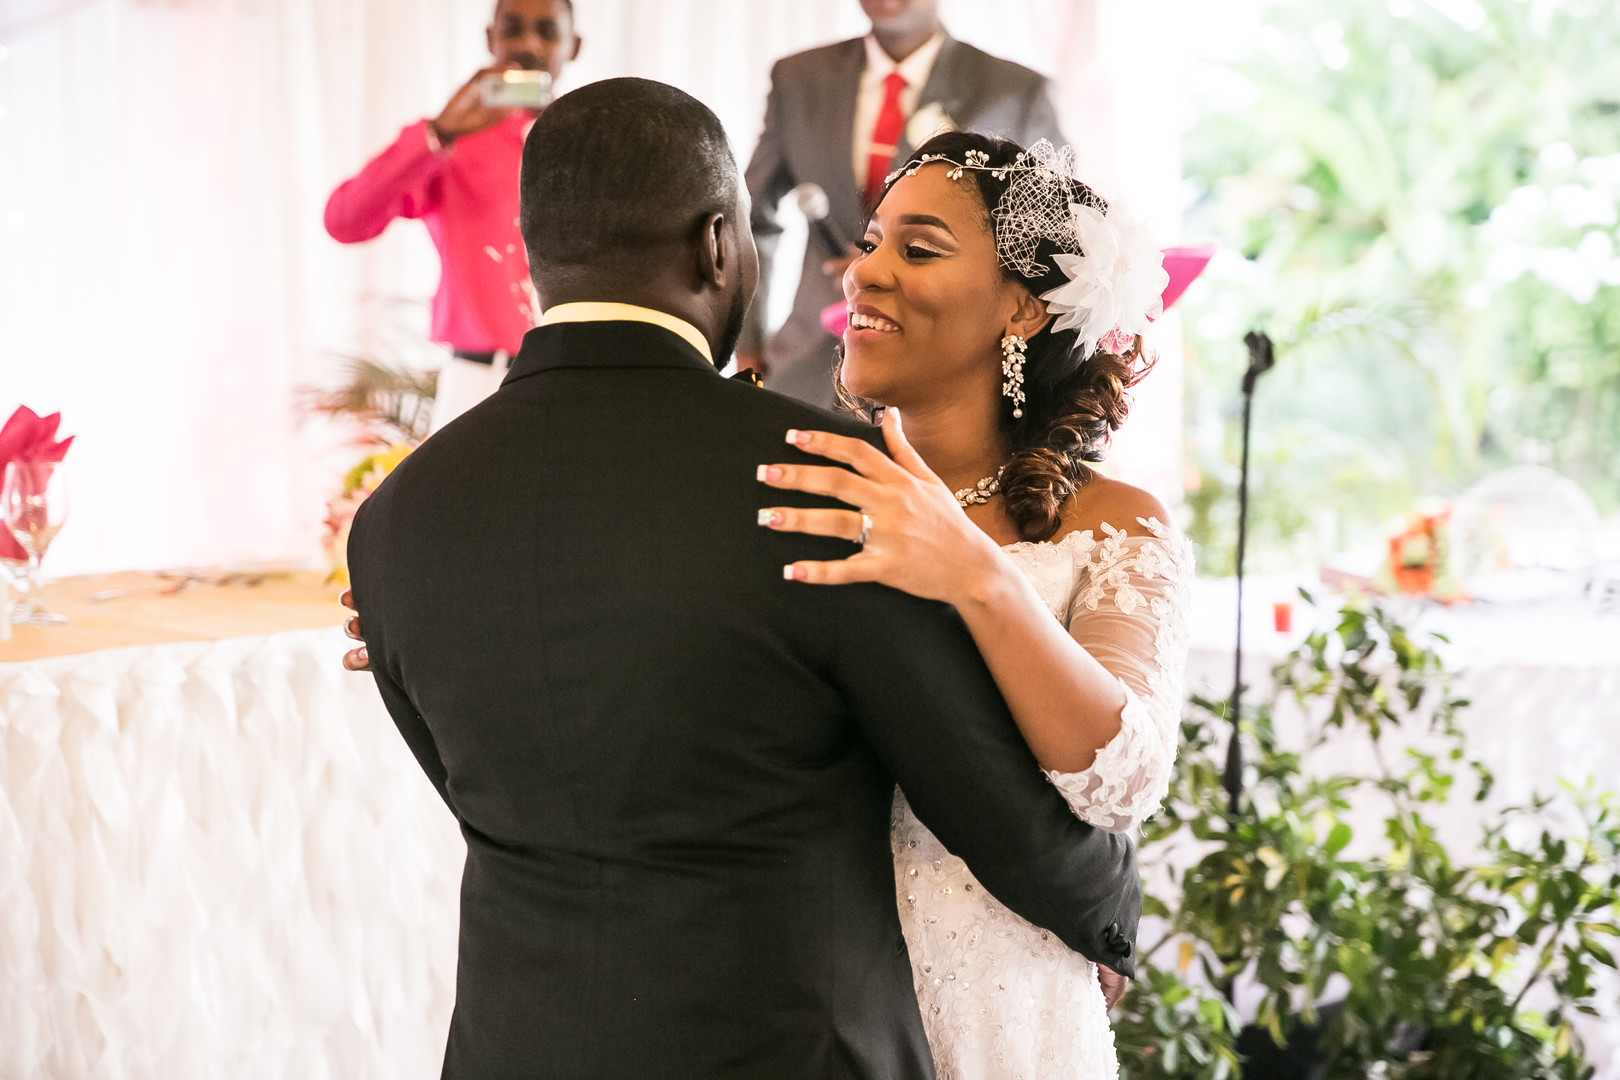 Wedding Pics (4 of 6).jpg